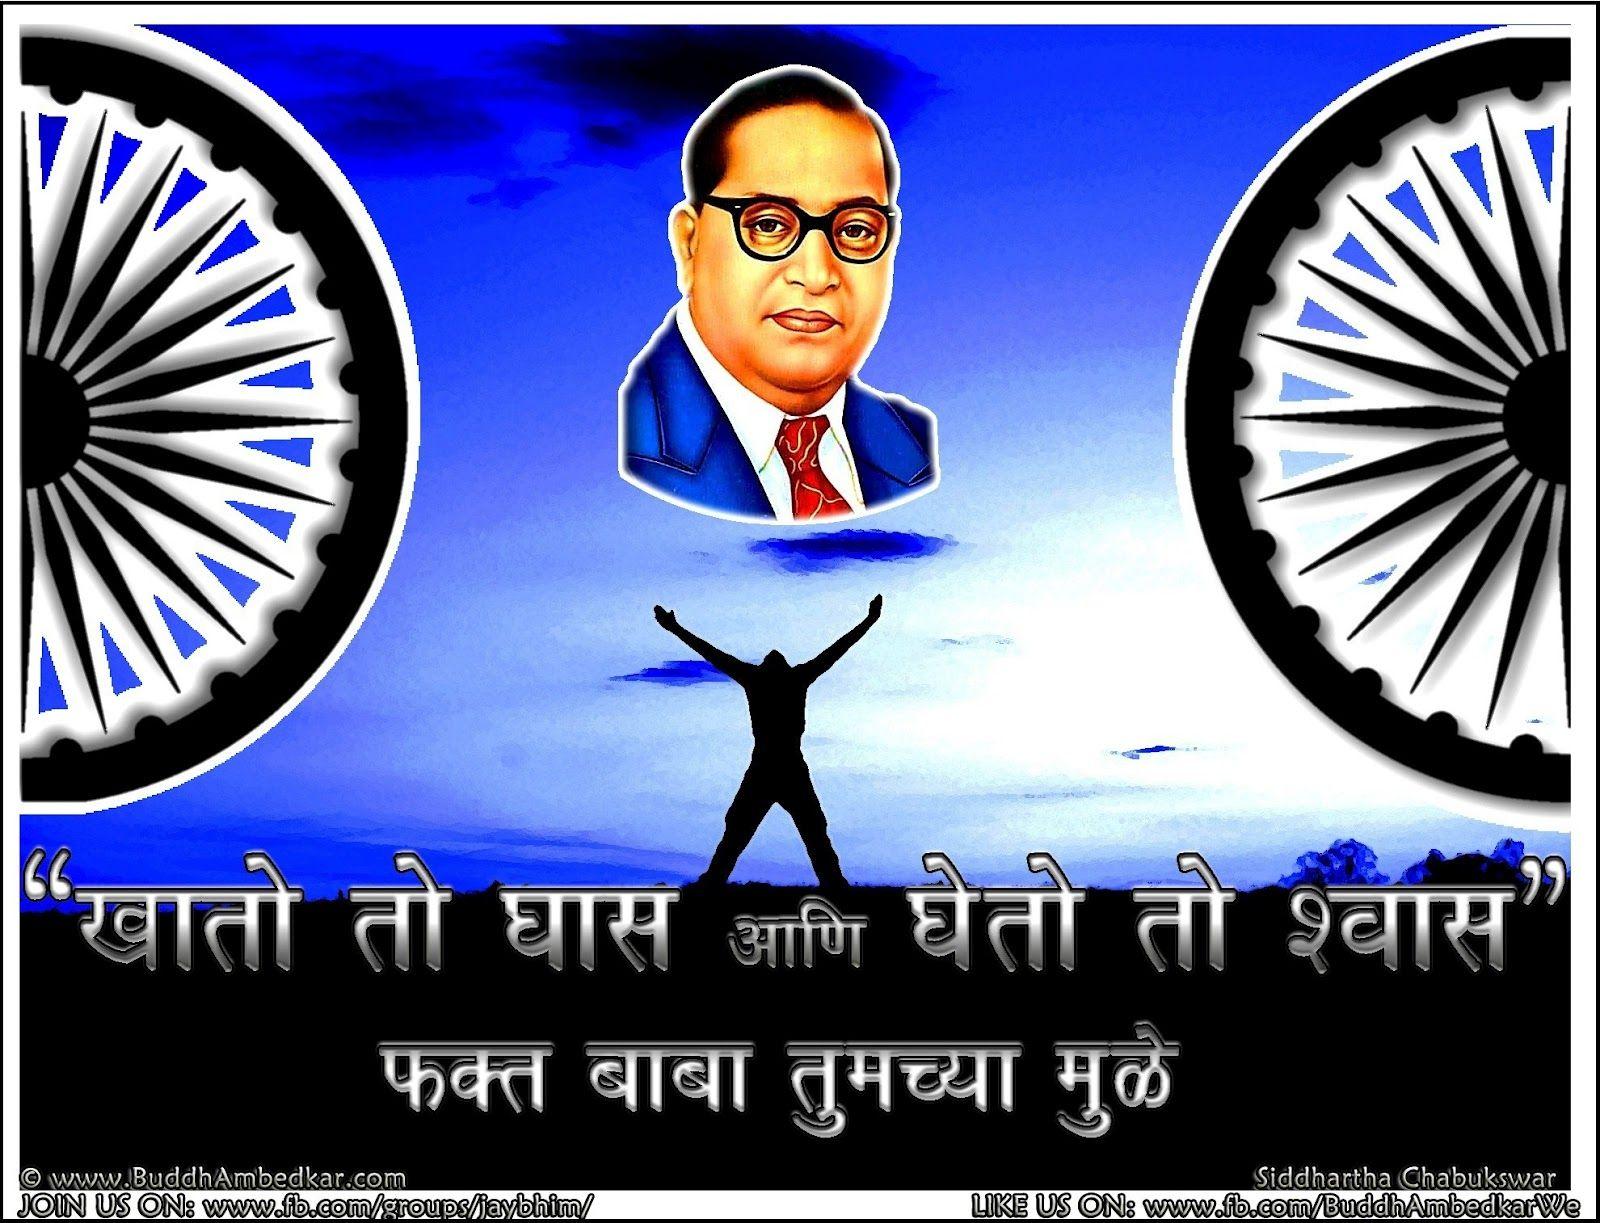 Dr Babasaheb Ambedkar 3d Wallpaper Jaybhim In Wallpaper Downloads 3d Wallpaper Wallpaper